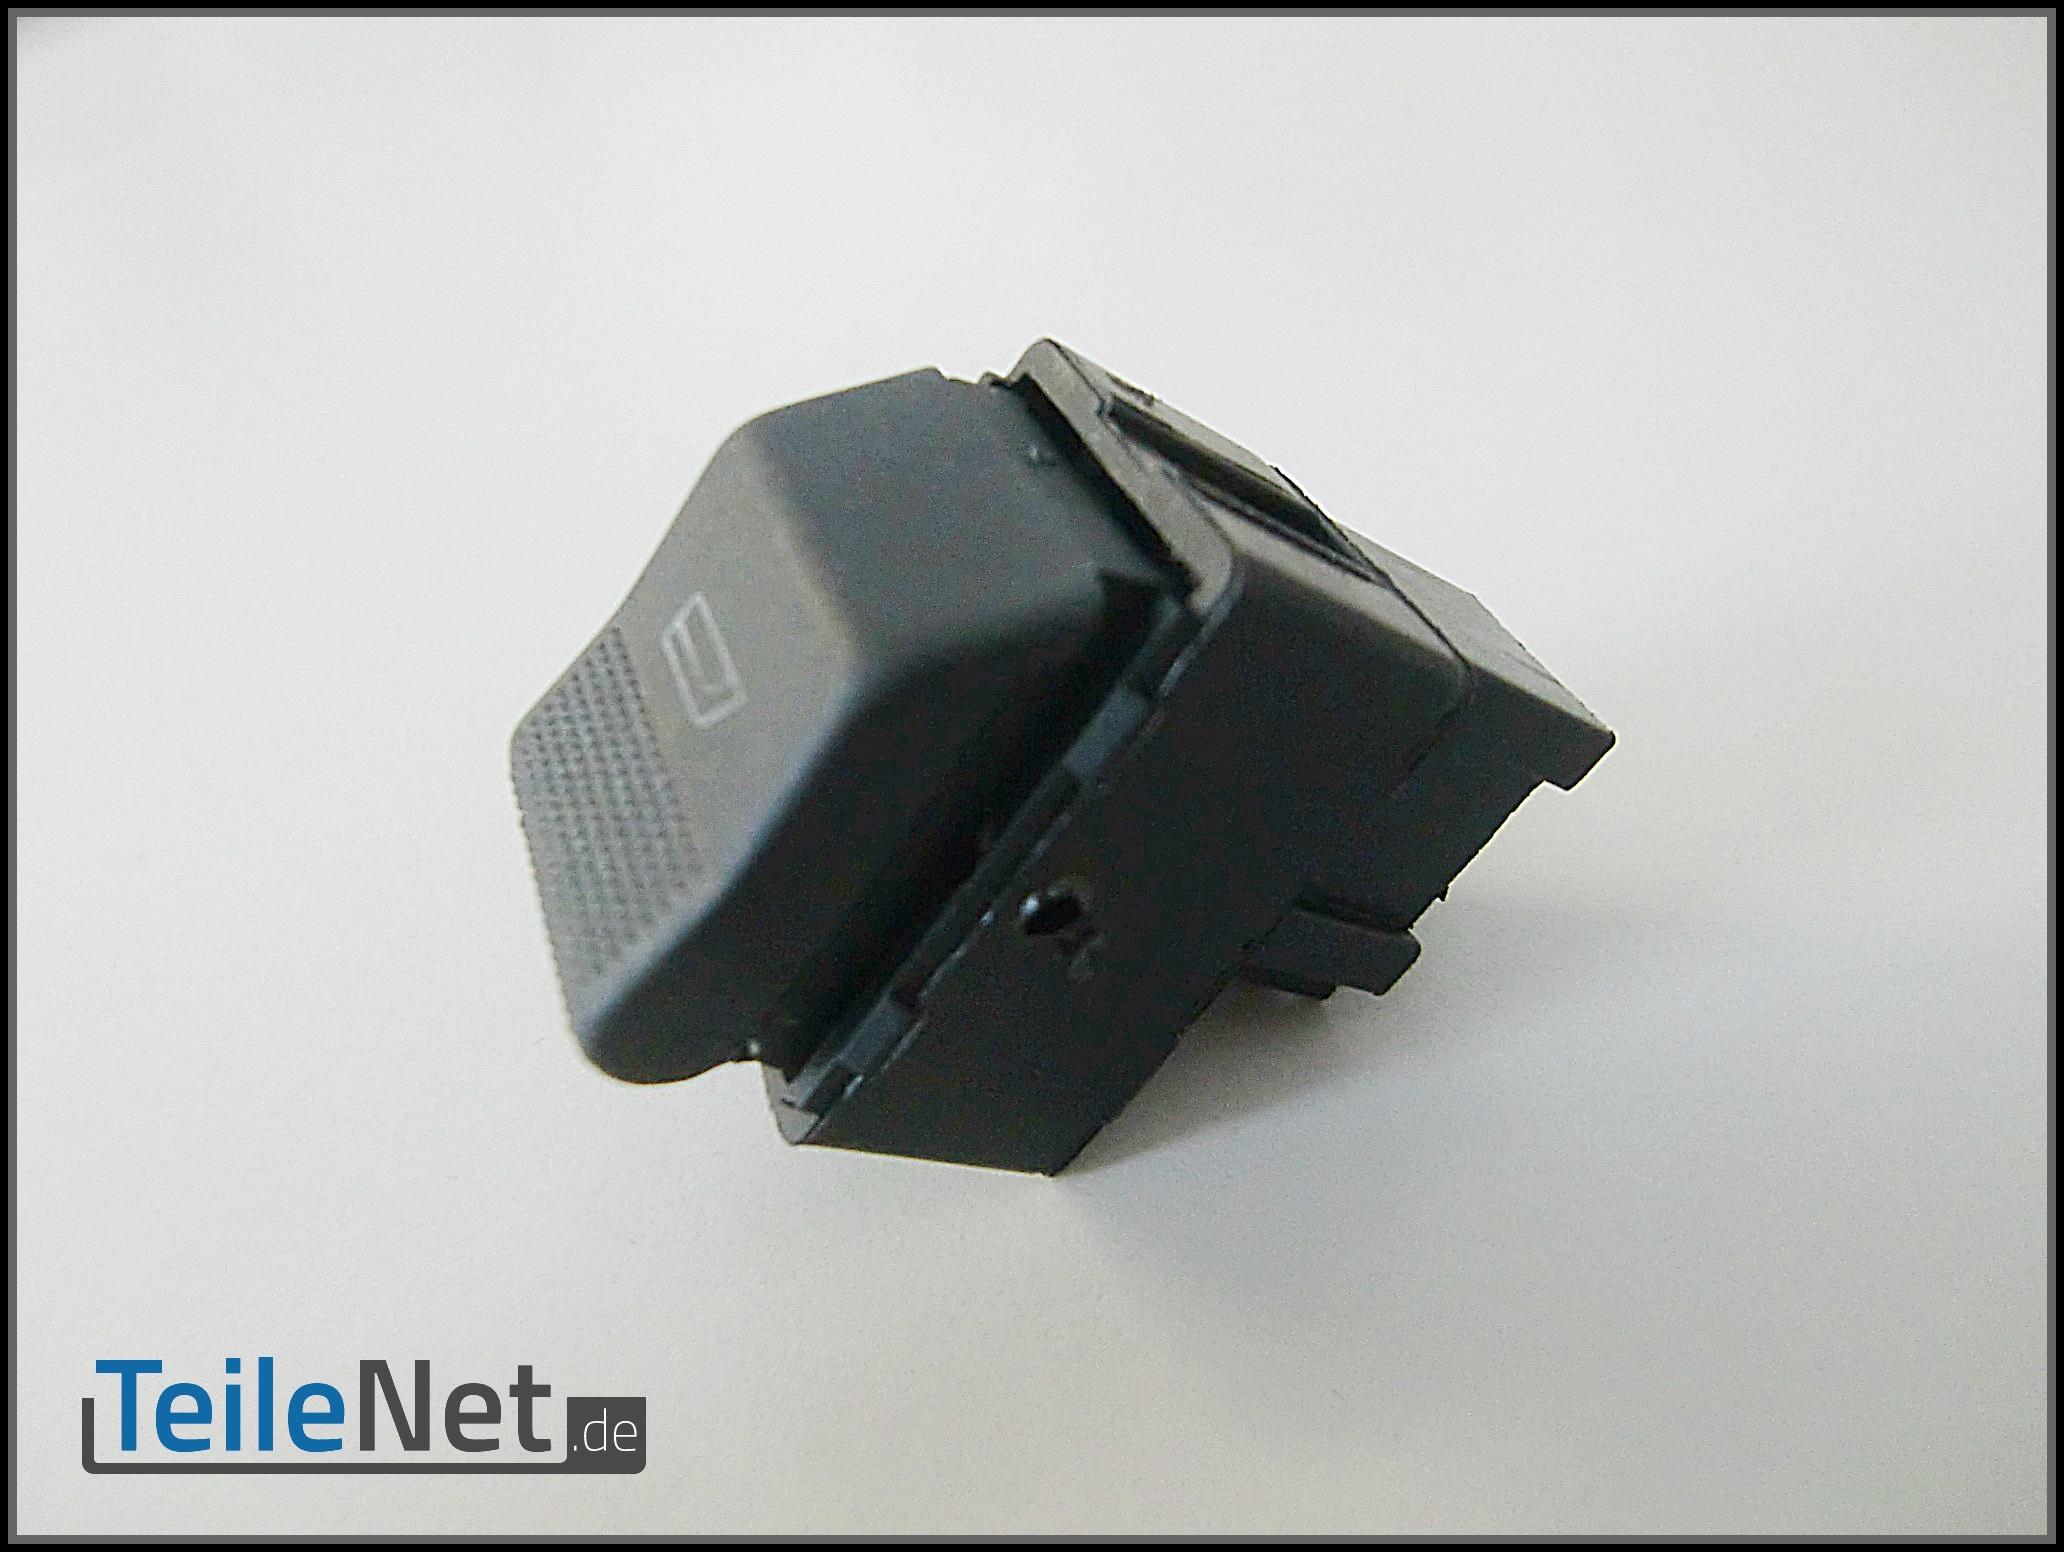 elektrische fensterheber schalter fensterheberschalter seat arosa links ebay. Black Bedroom Furniture Sets. Home Design Ideas